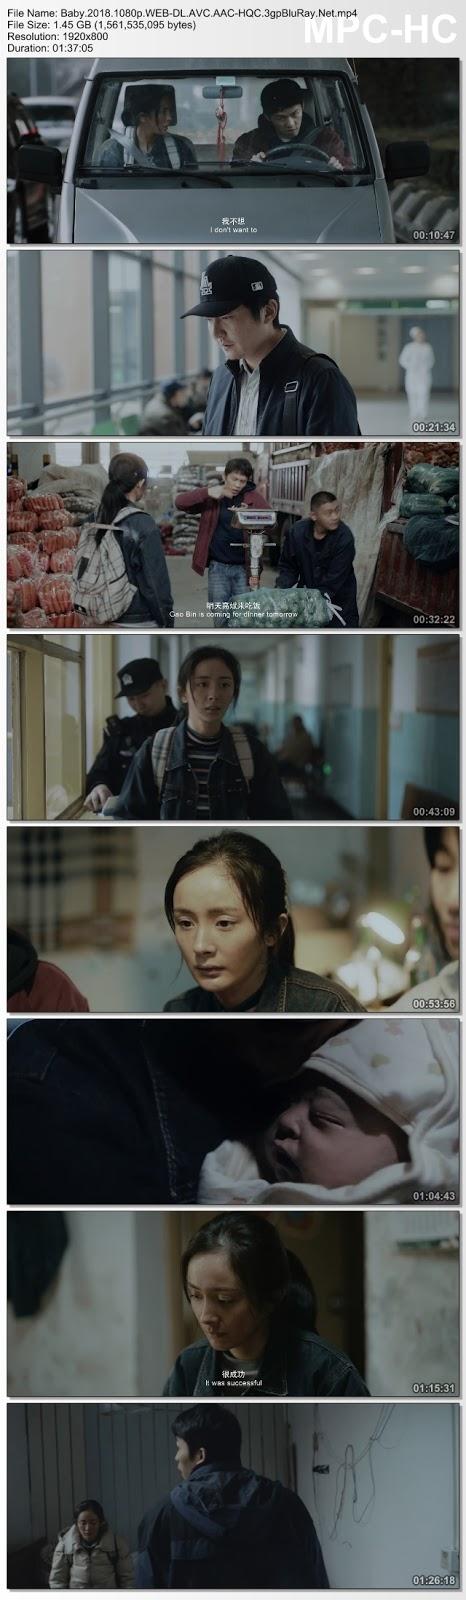 Screenshots Download Bao Bei Er (2018)